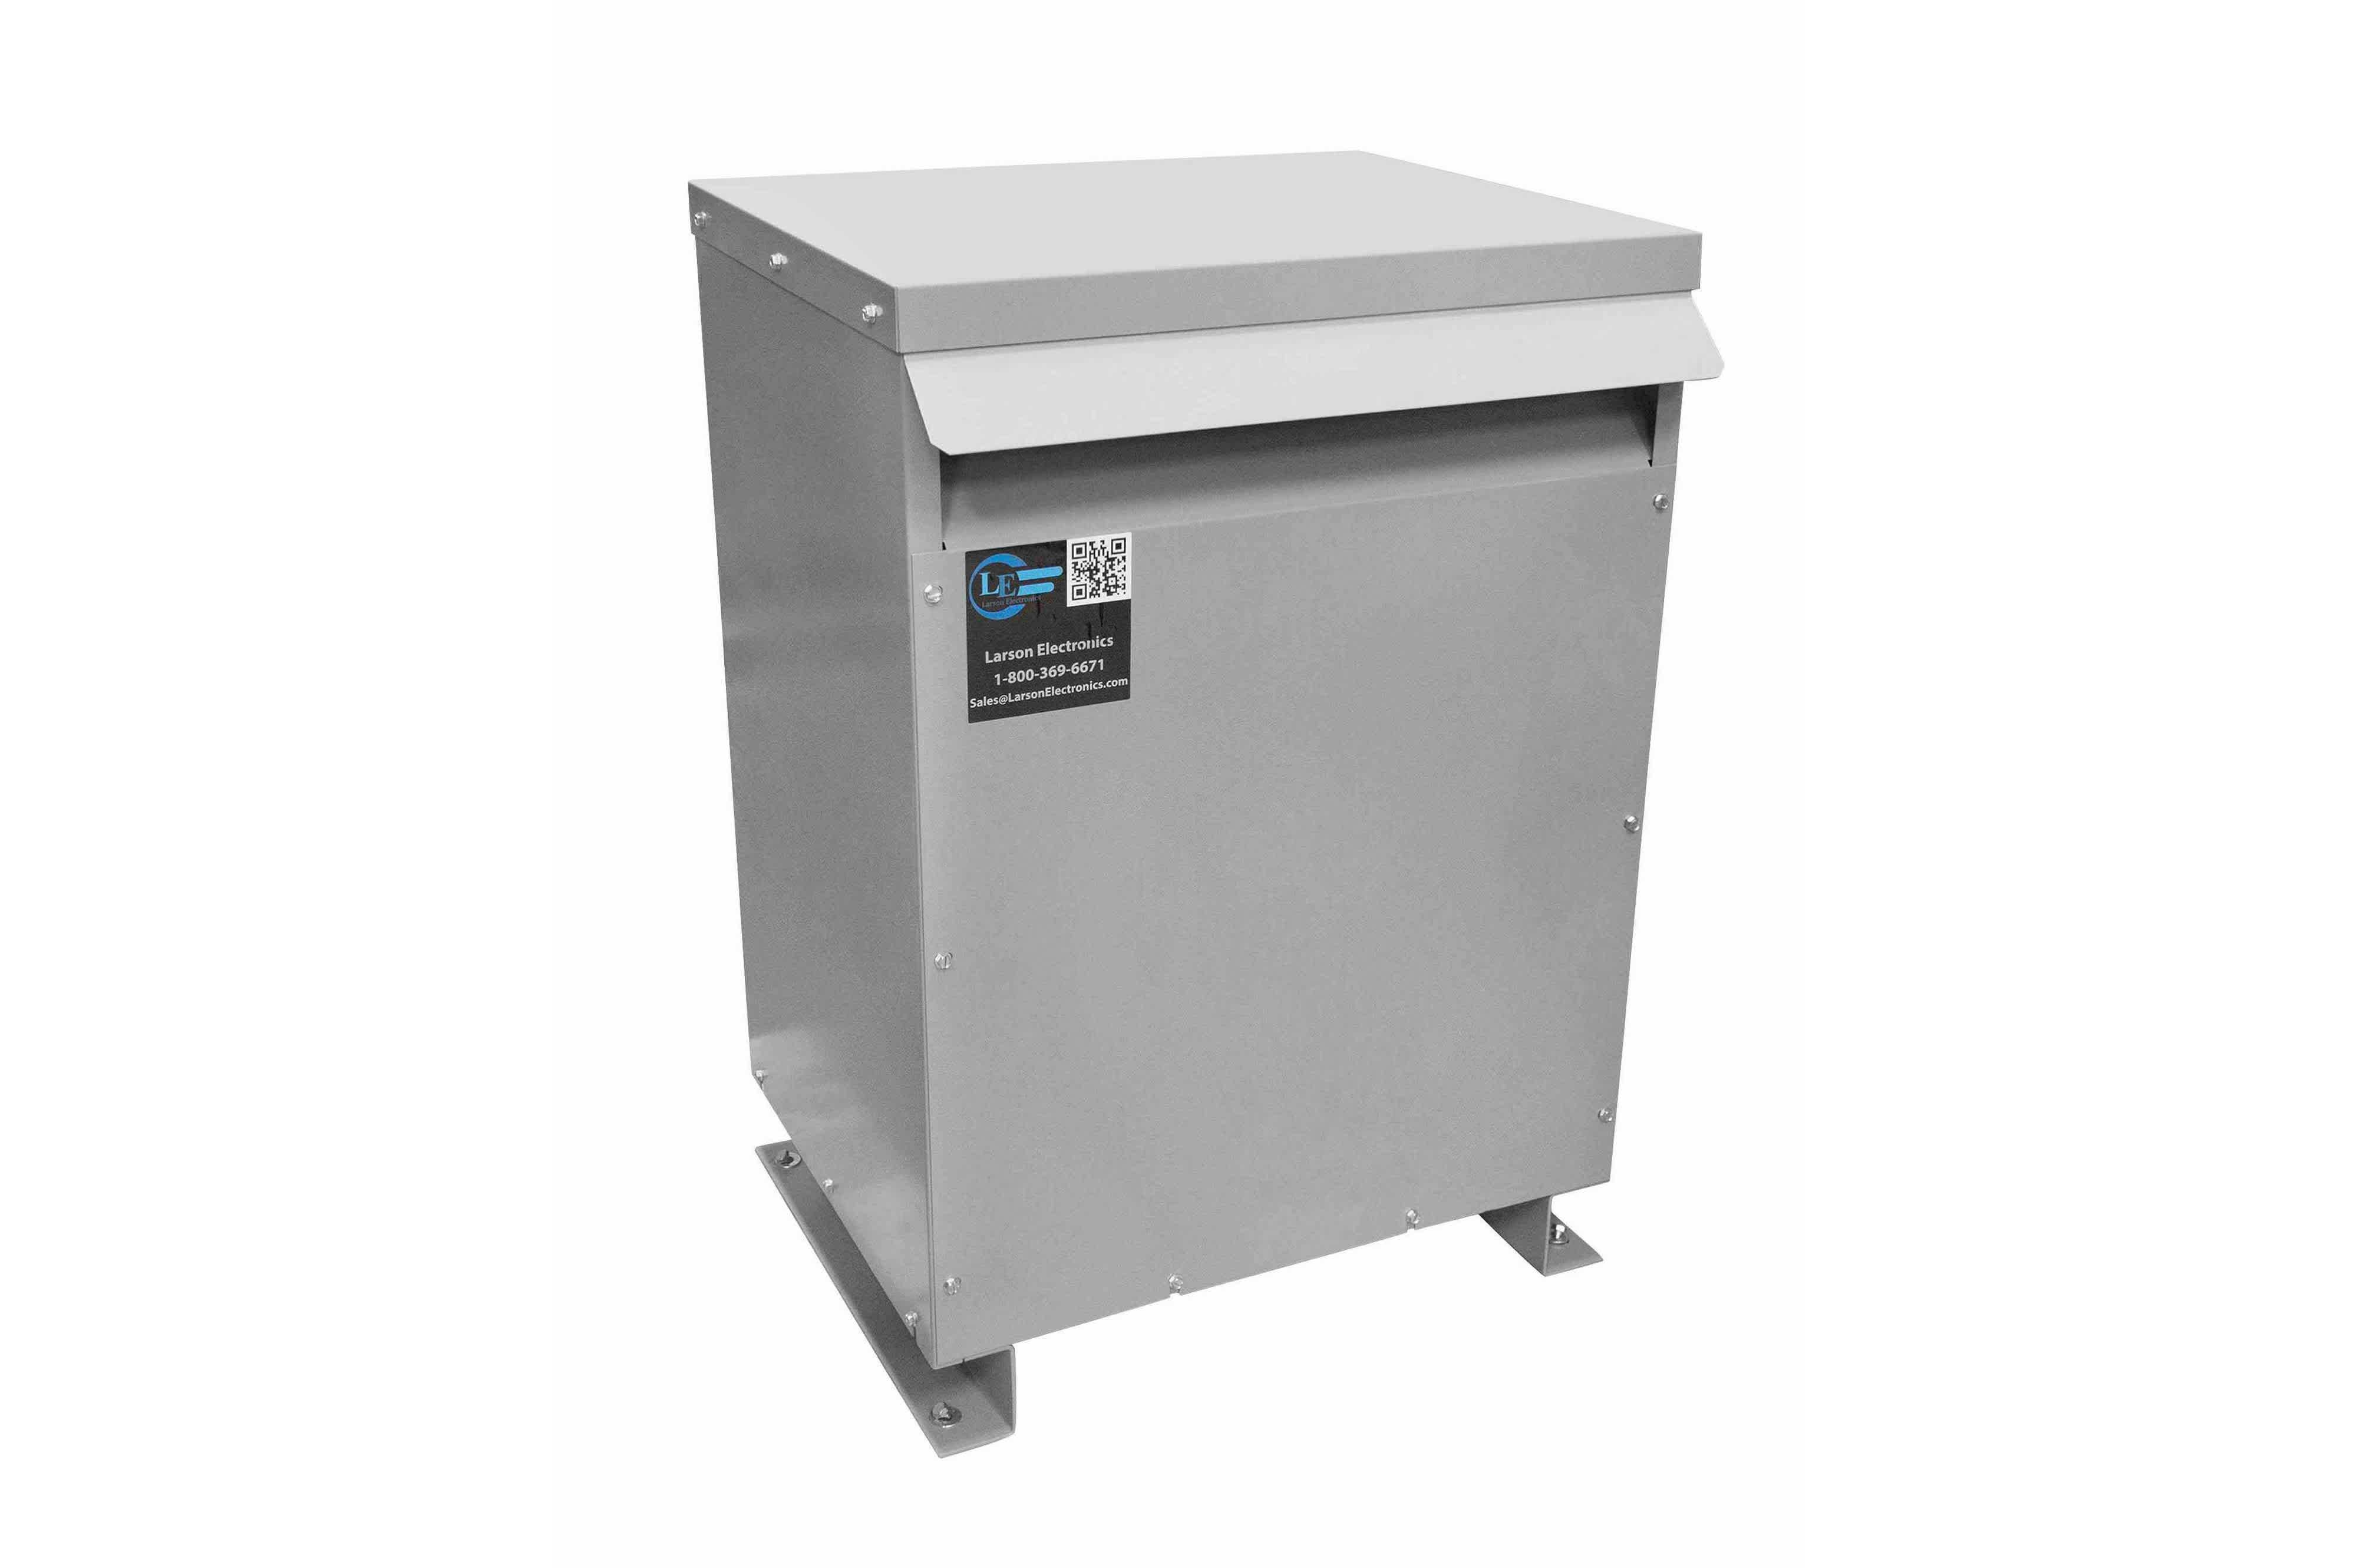 60 kVA 3PH Isolation Transformer, 400V Wye Primary, 240V Delta Secondary, N3R, Ventilated, 60 Hz